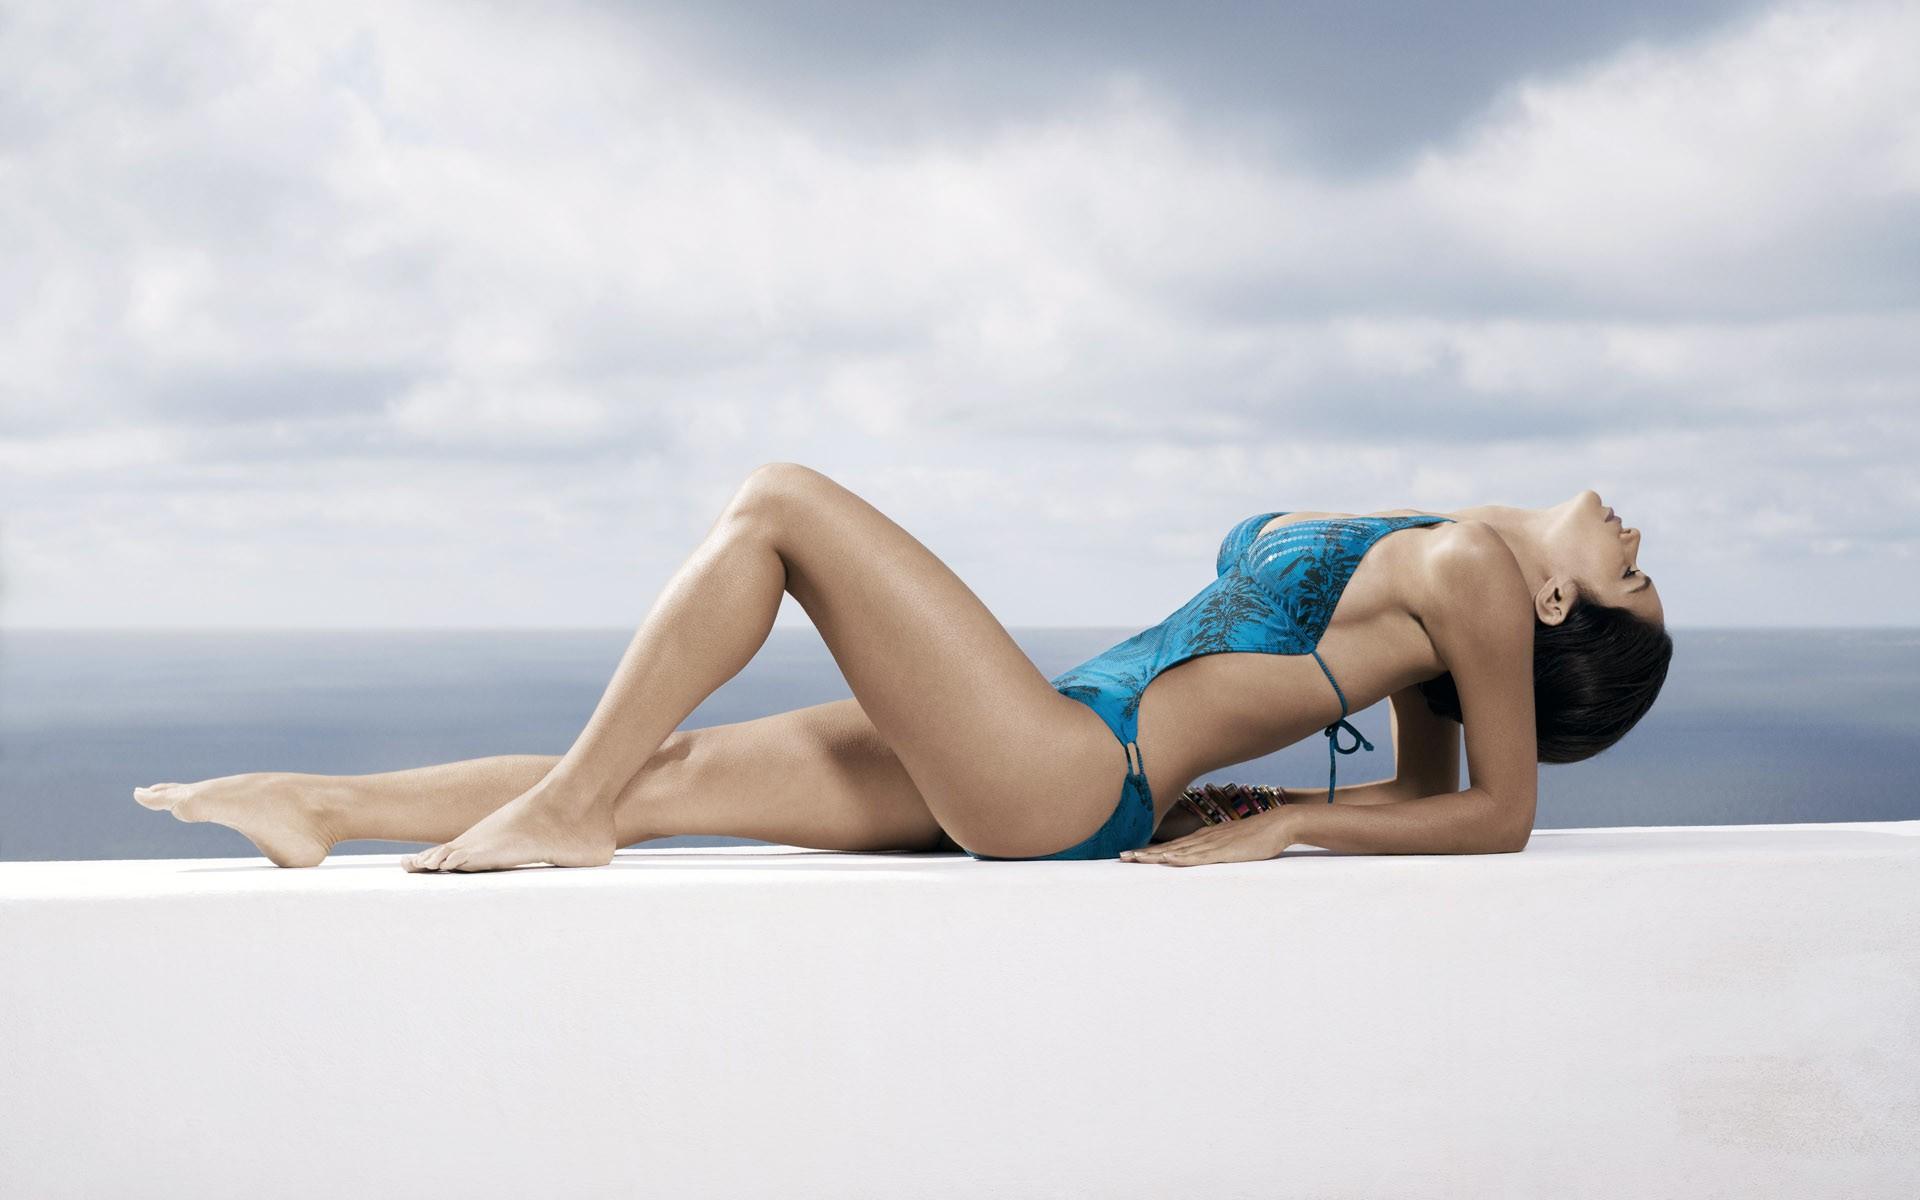 Порно тело девушки в купальнике картинки анал видео